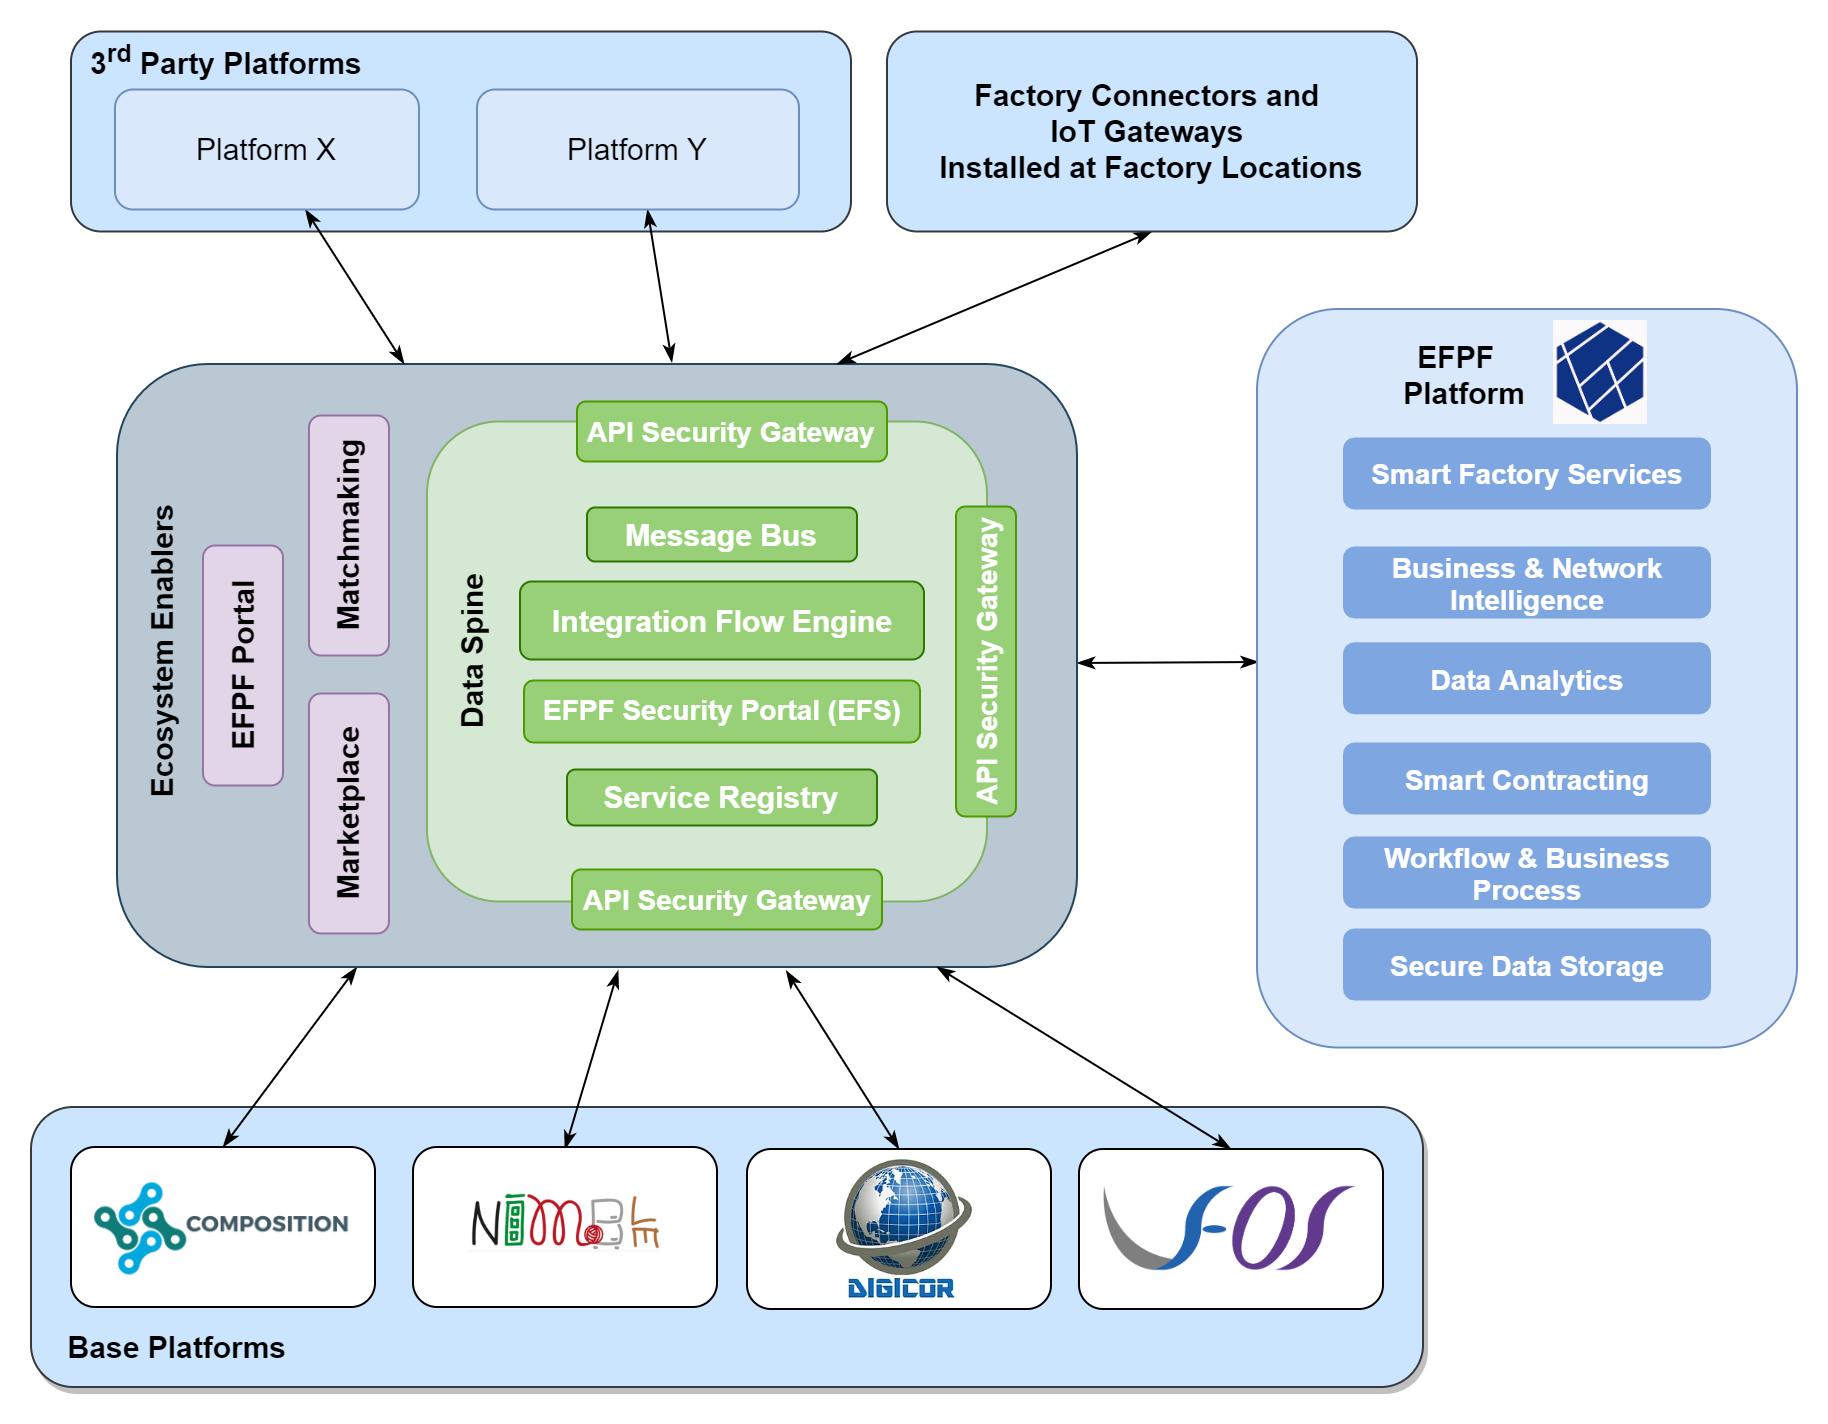 The EFPF ecosystem